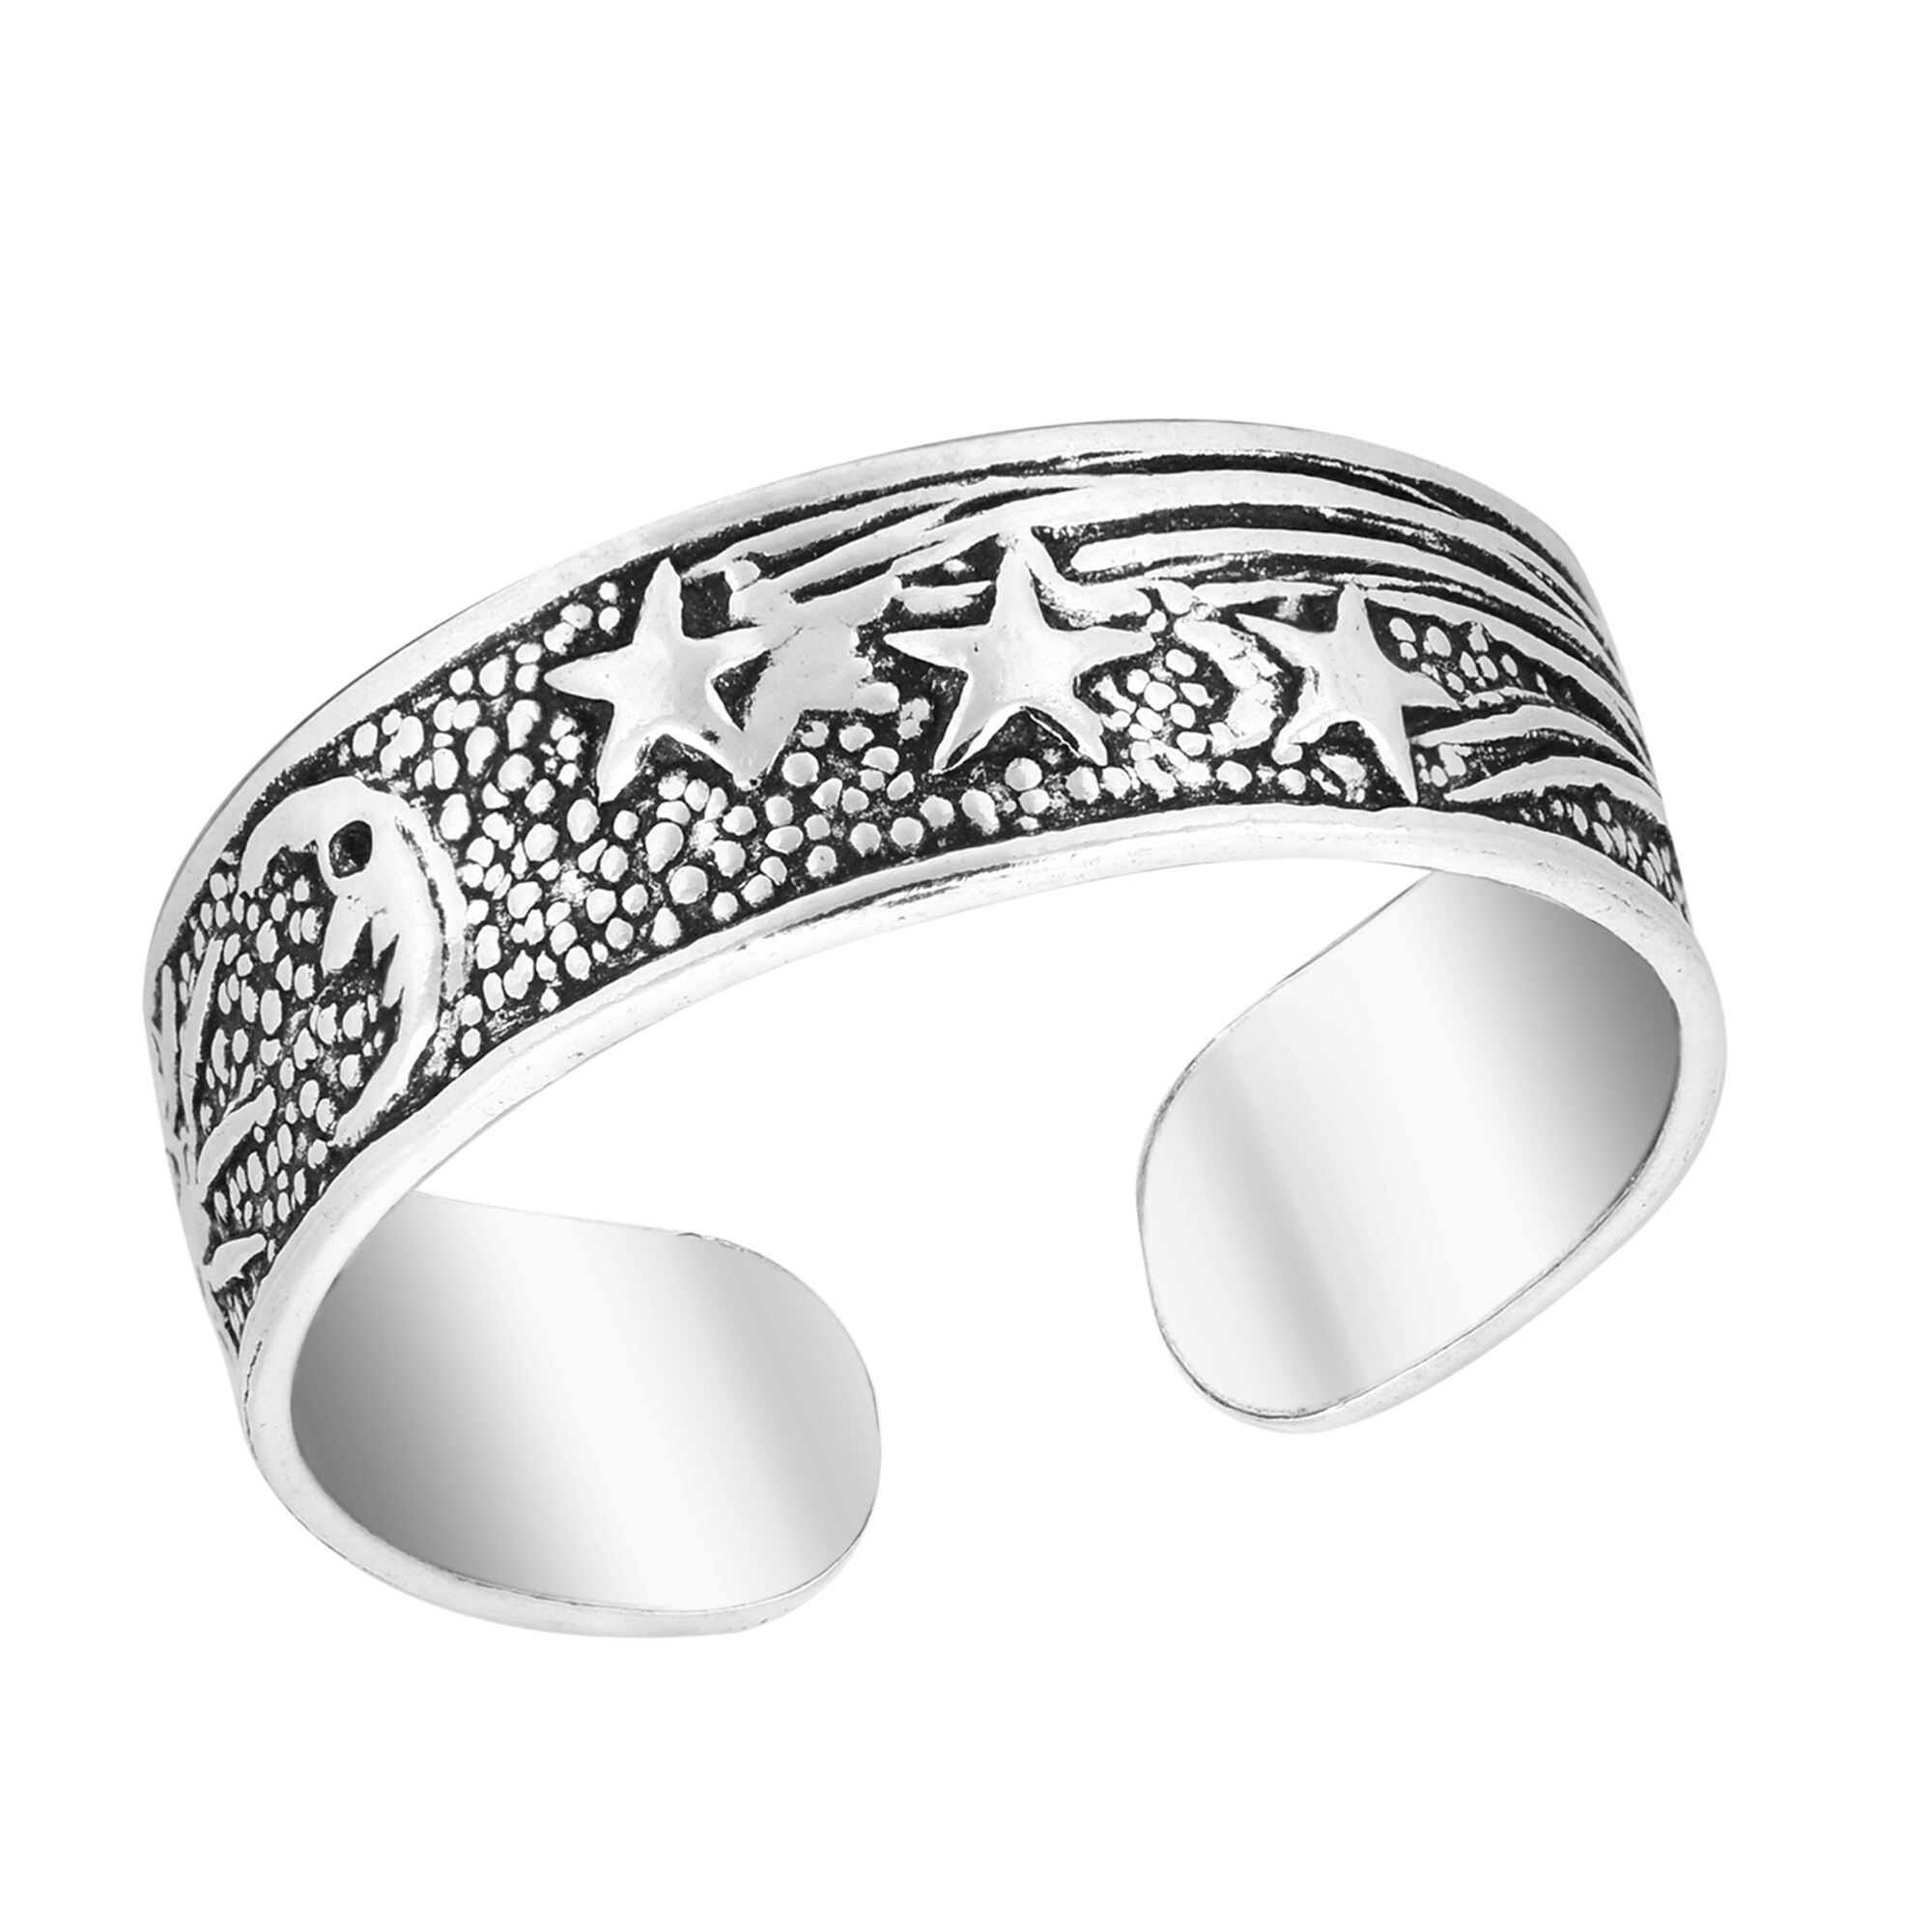 Star Moon Sun Adjustable Toe Ring Genuine Sterling Silver 925 Best Deal Jewelry